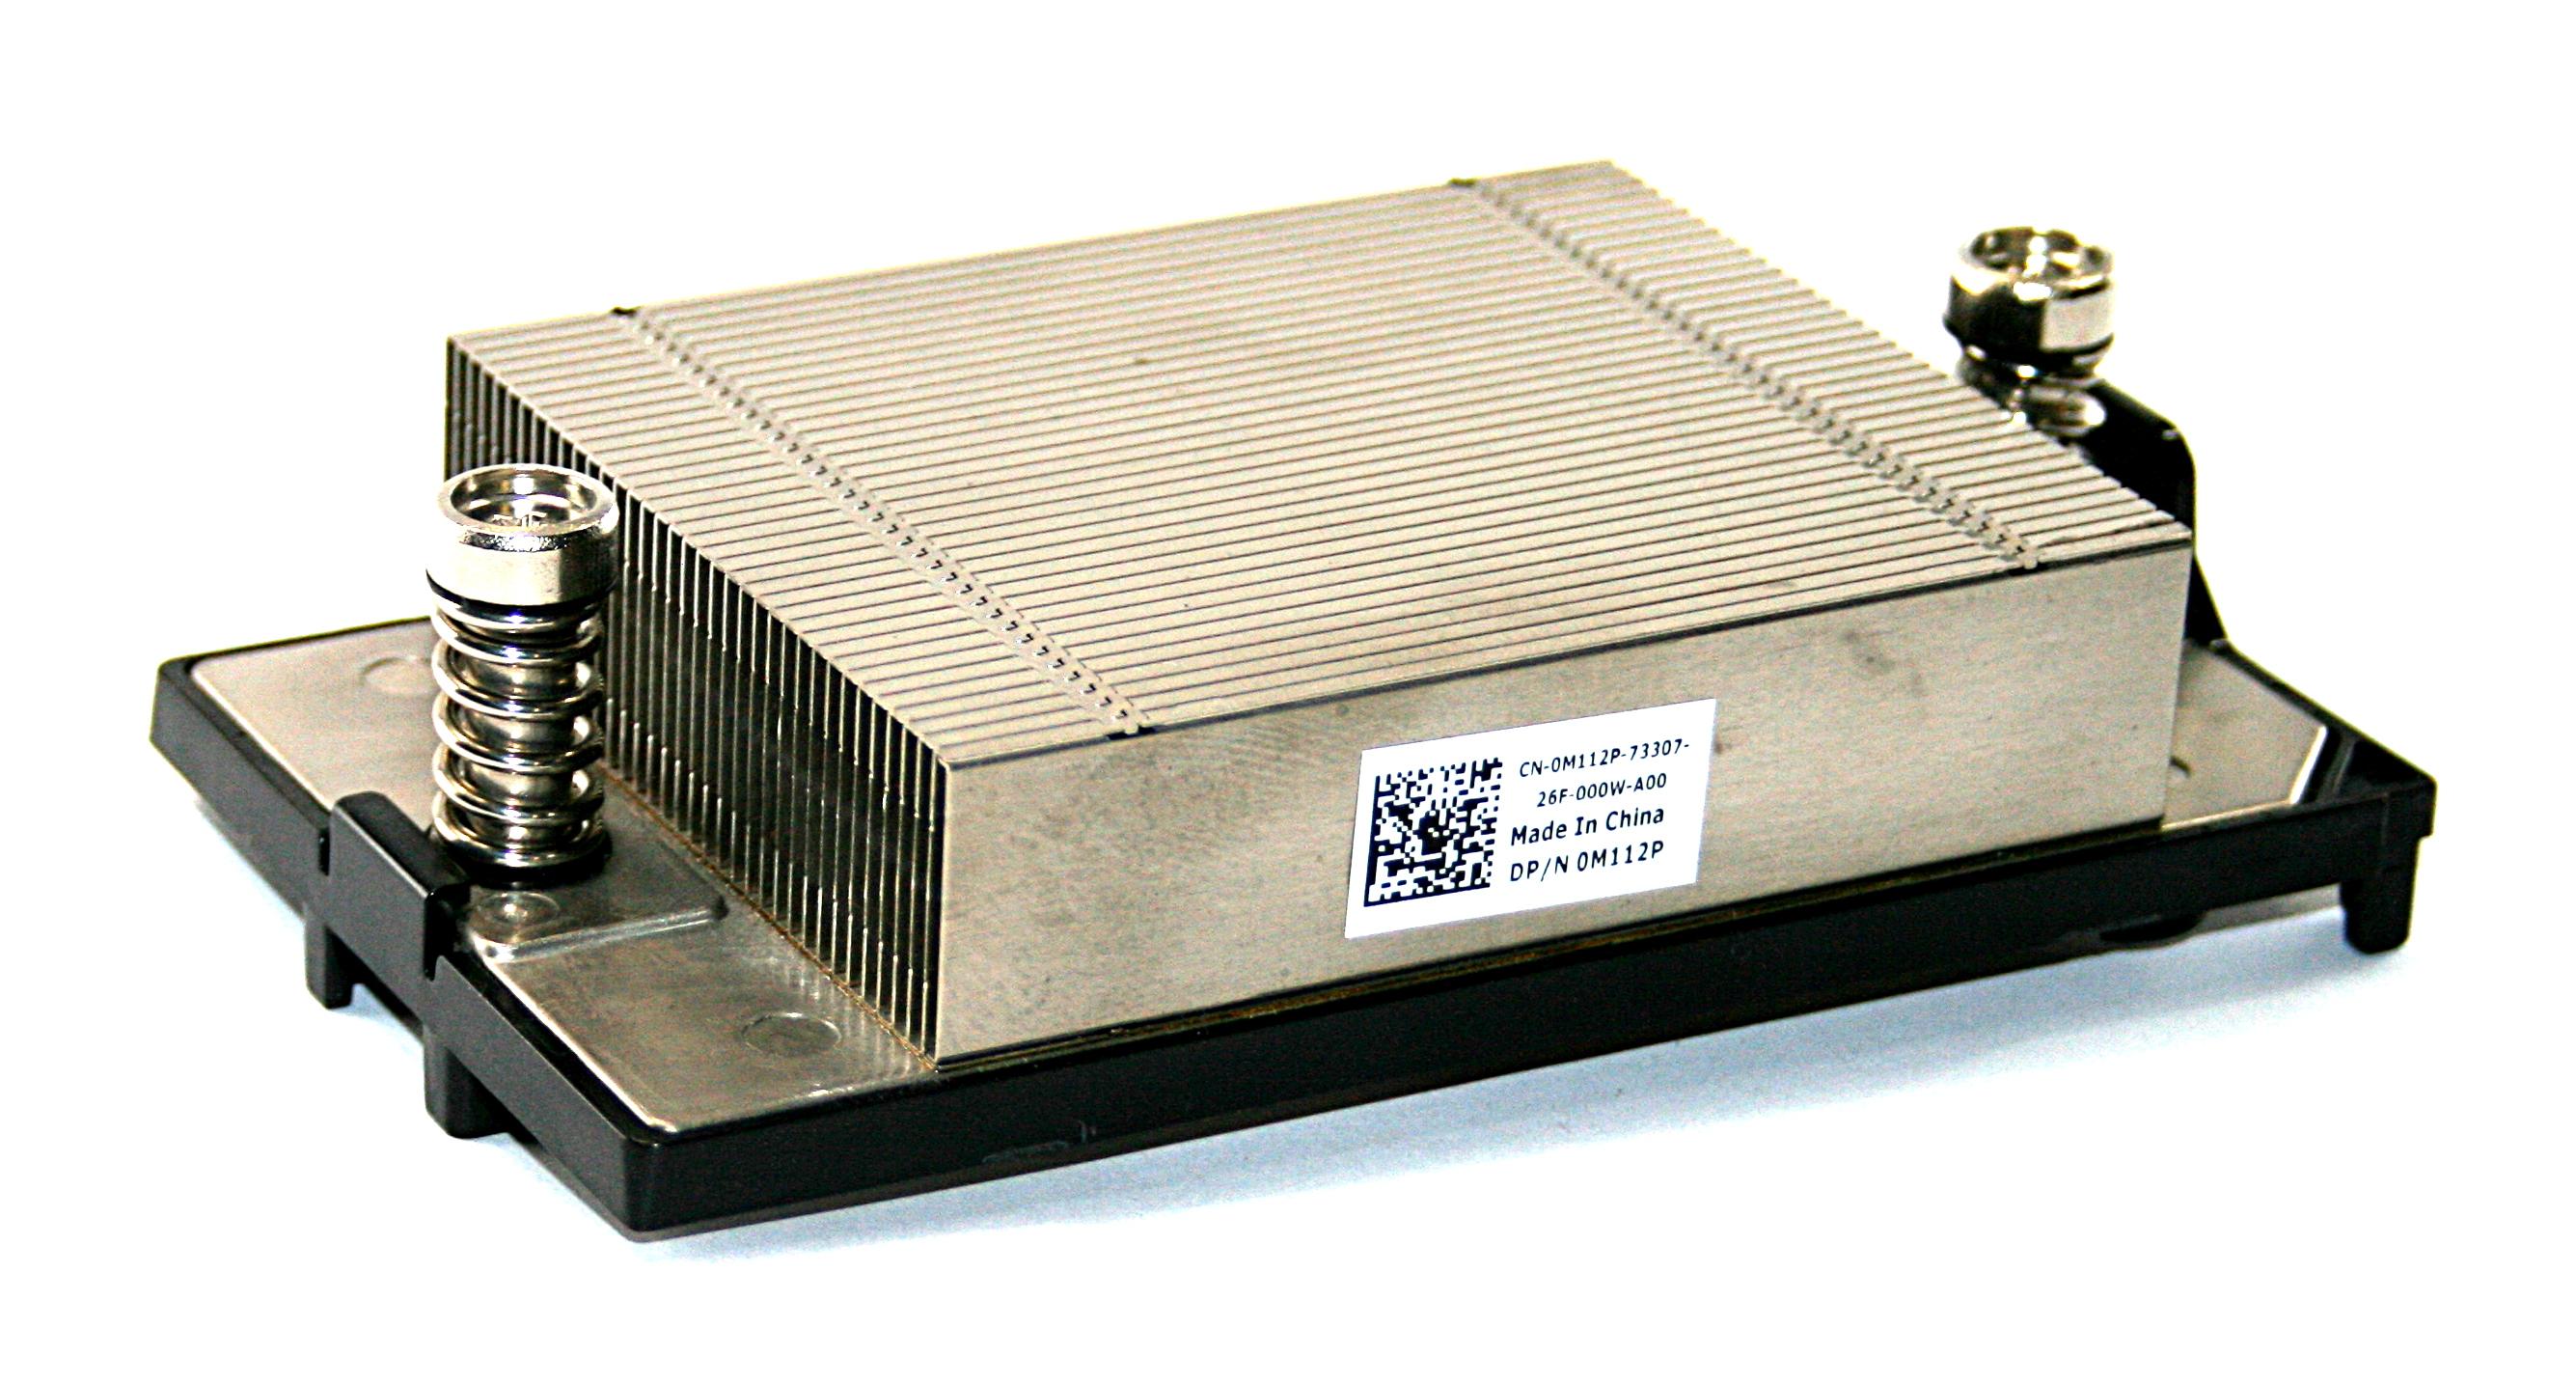 Genuine Dell M112P PowerEdge R620 CPU Heatsink Heat Sink